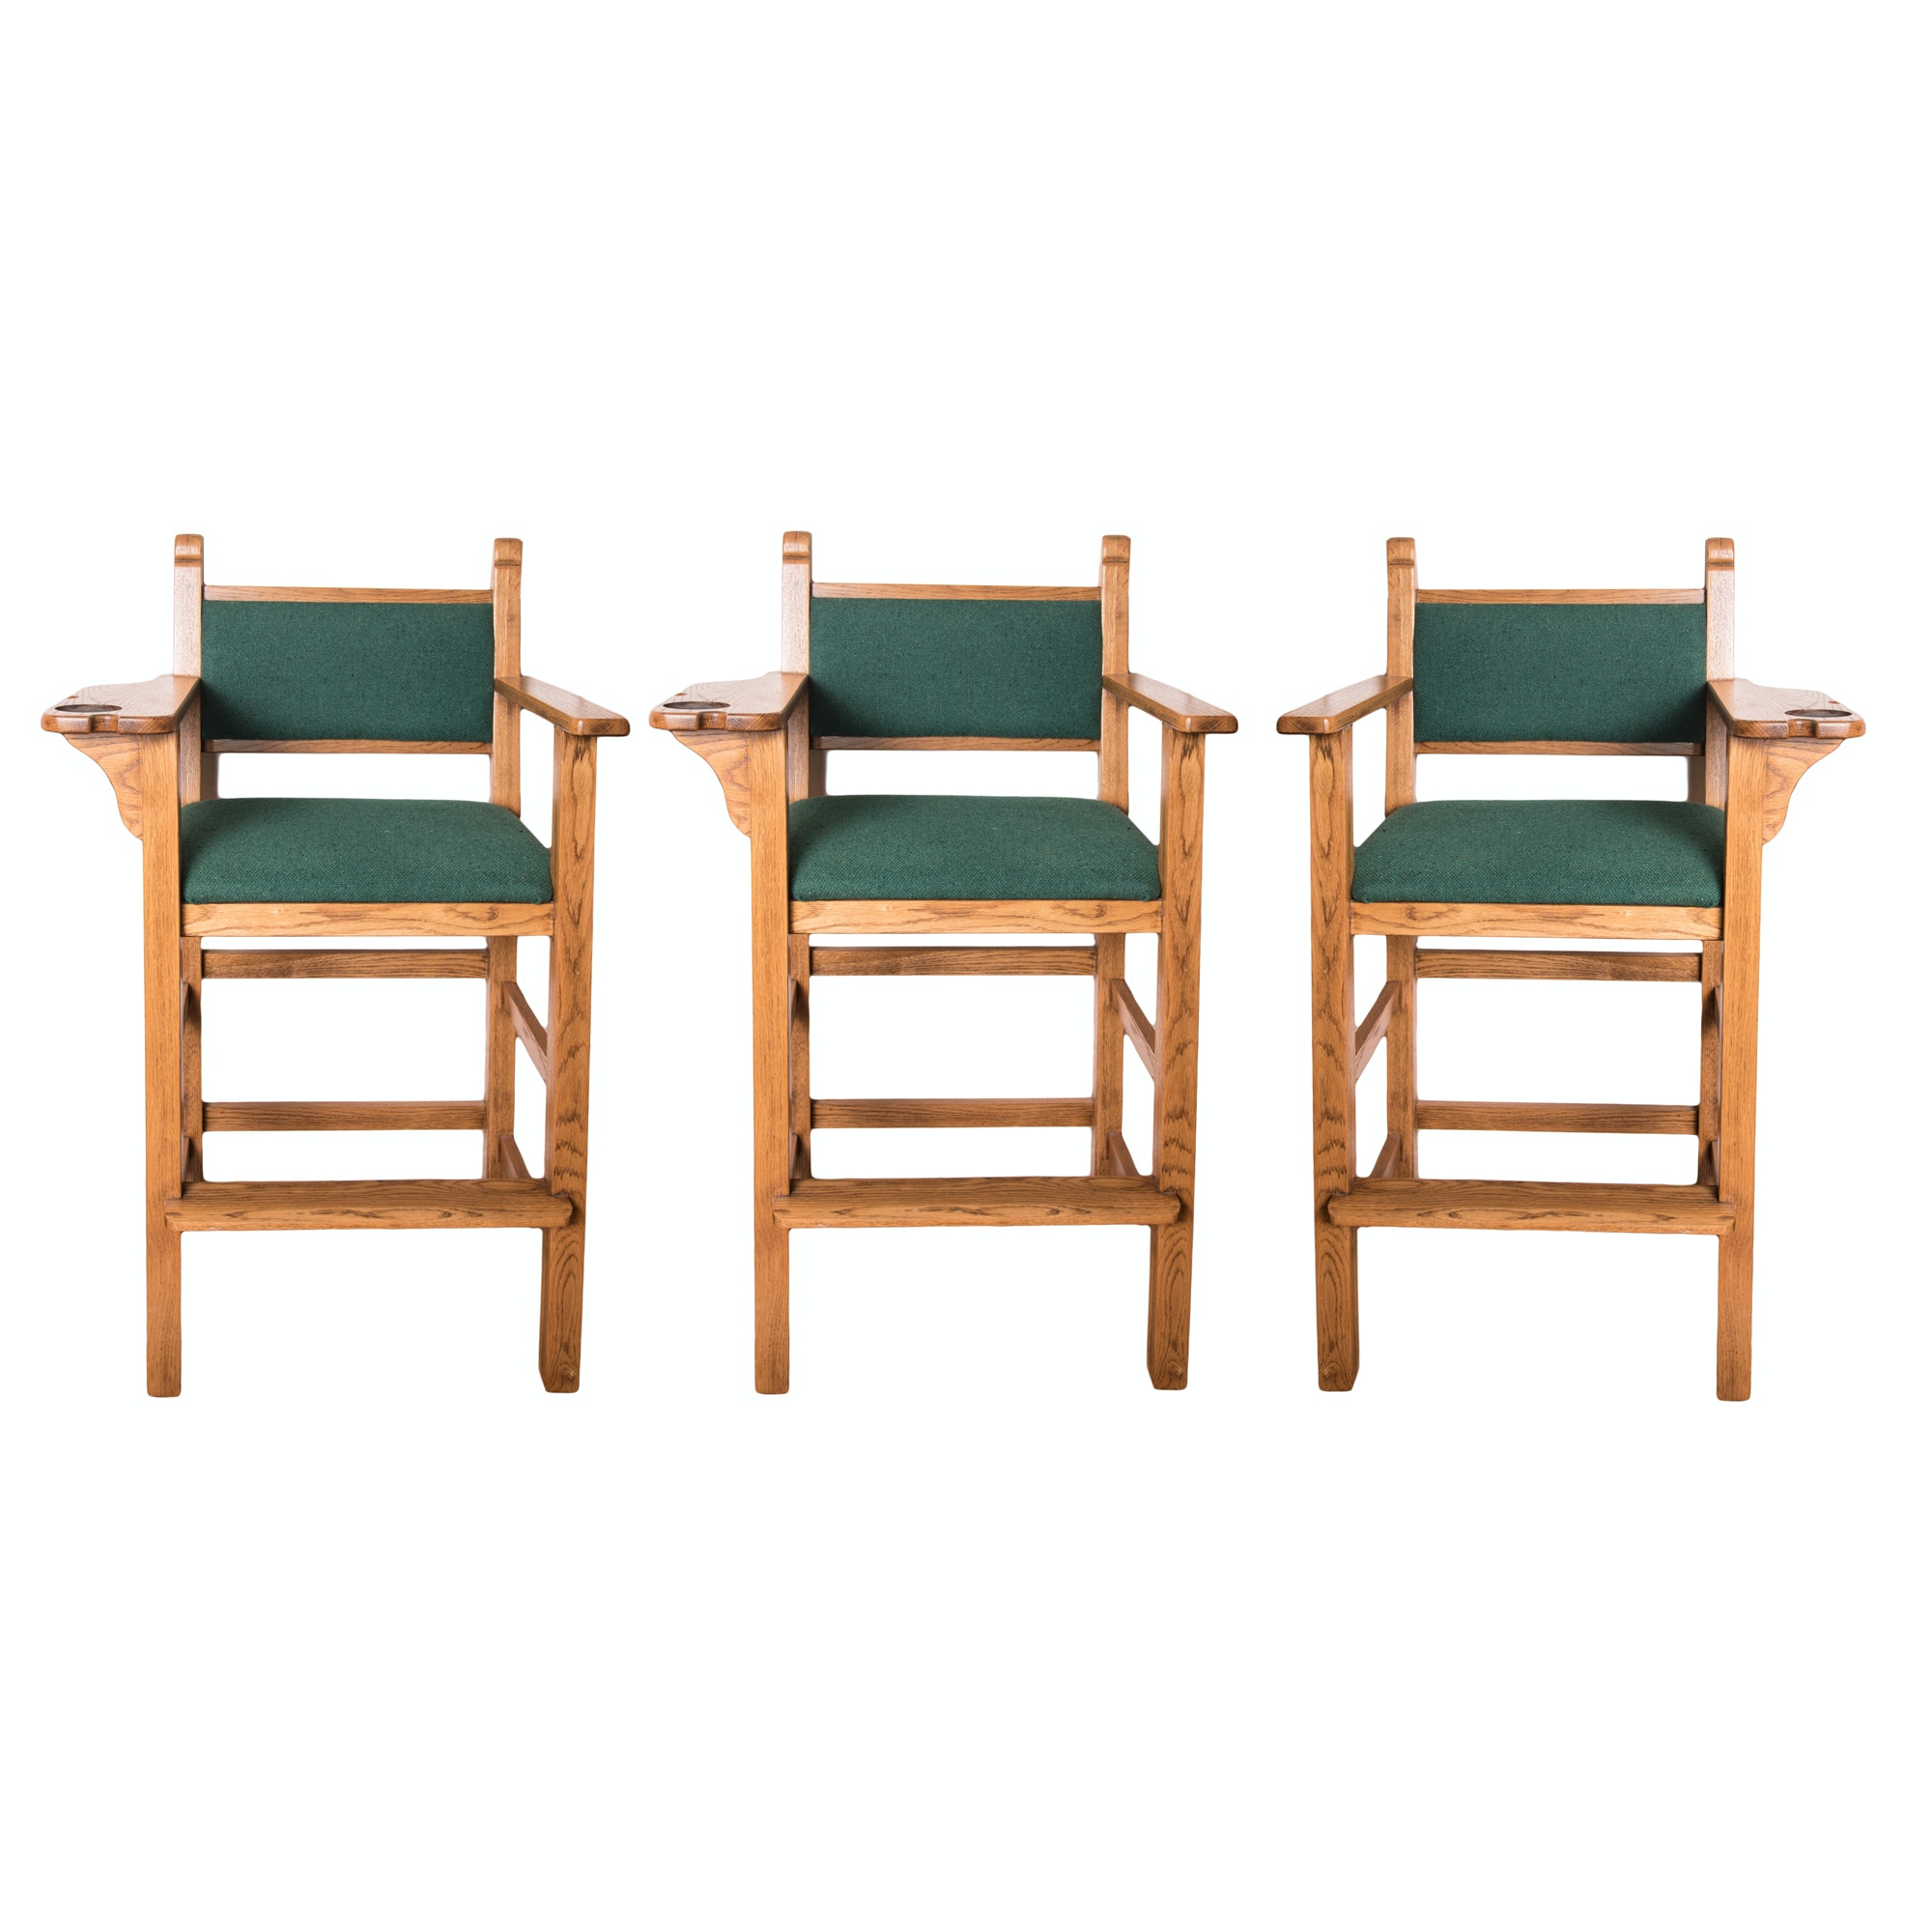 Billiard Game Chairs